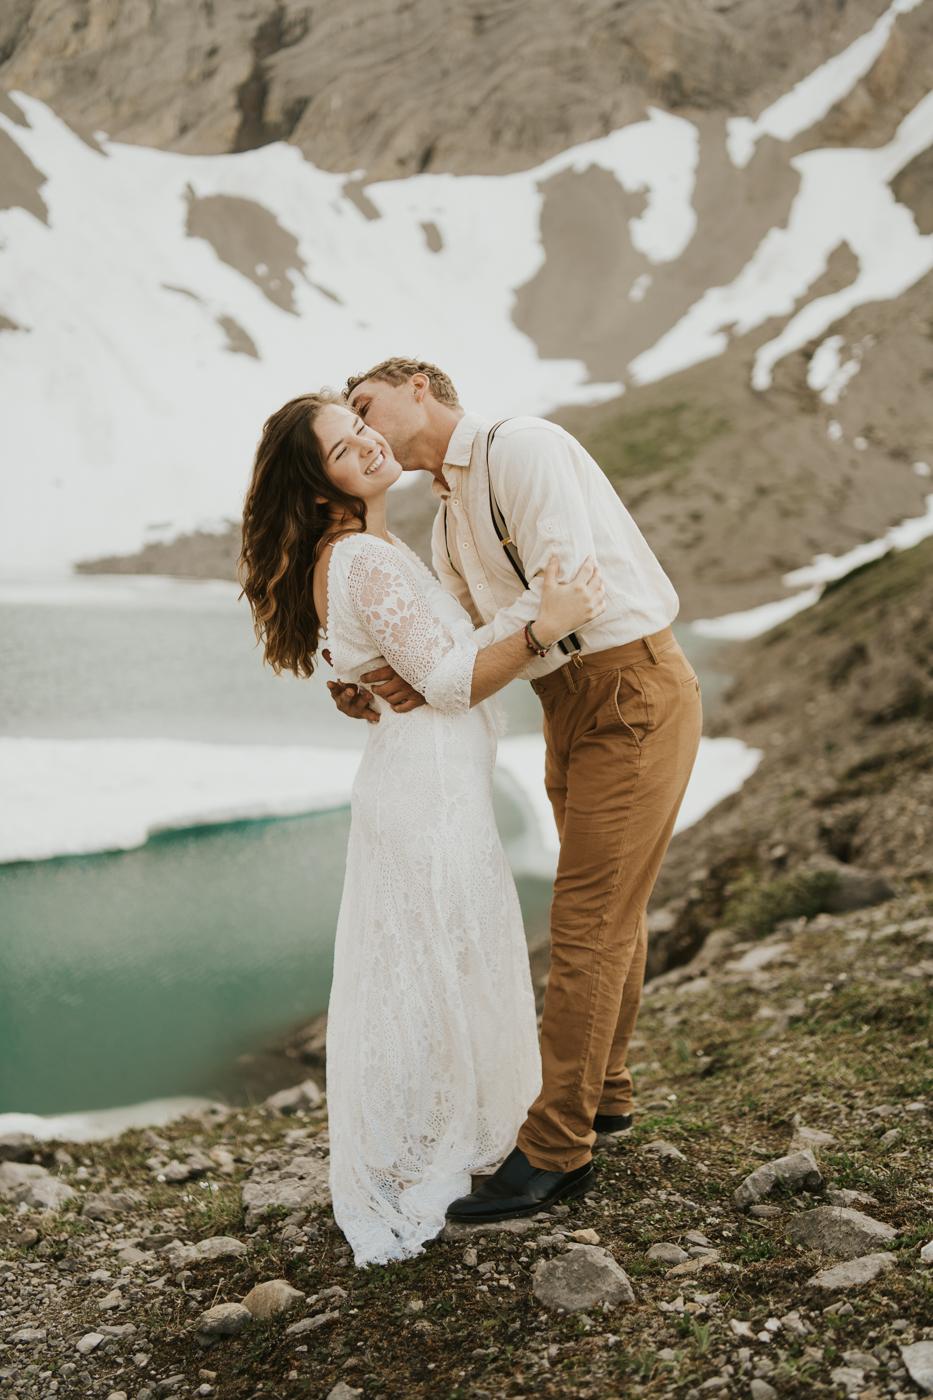 tyraephotography_photographer_wedding_elopement_engagement_photography-07610.jpg